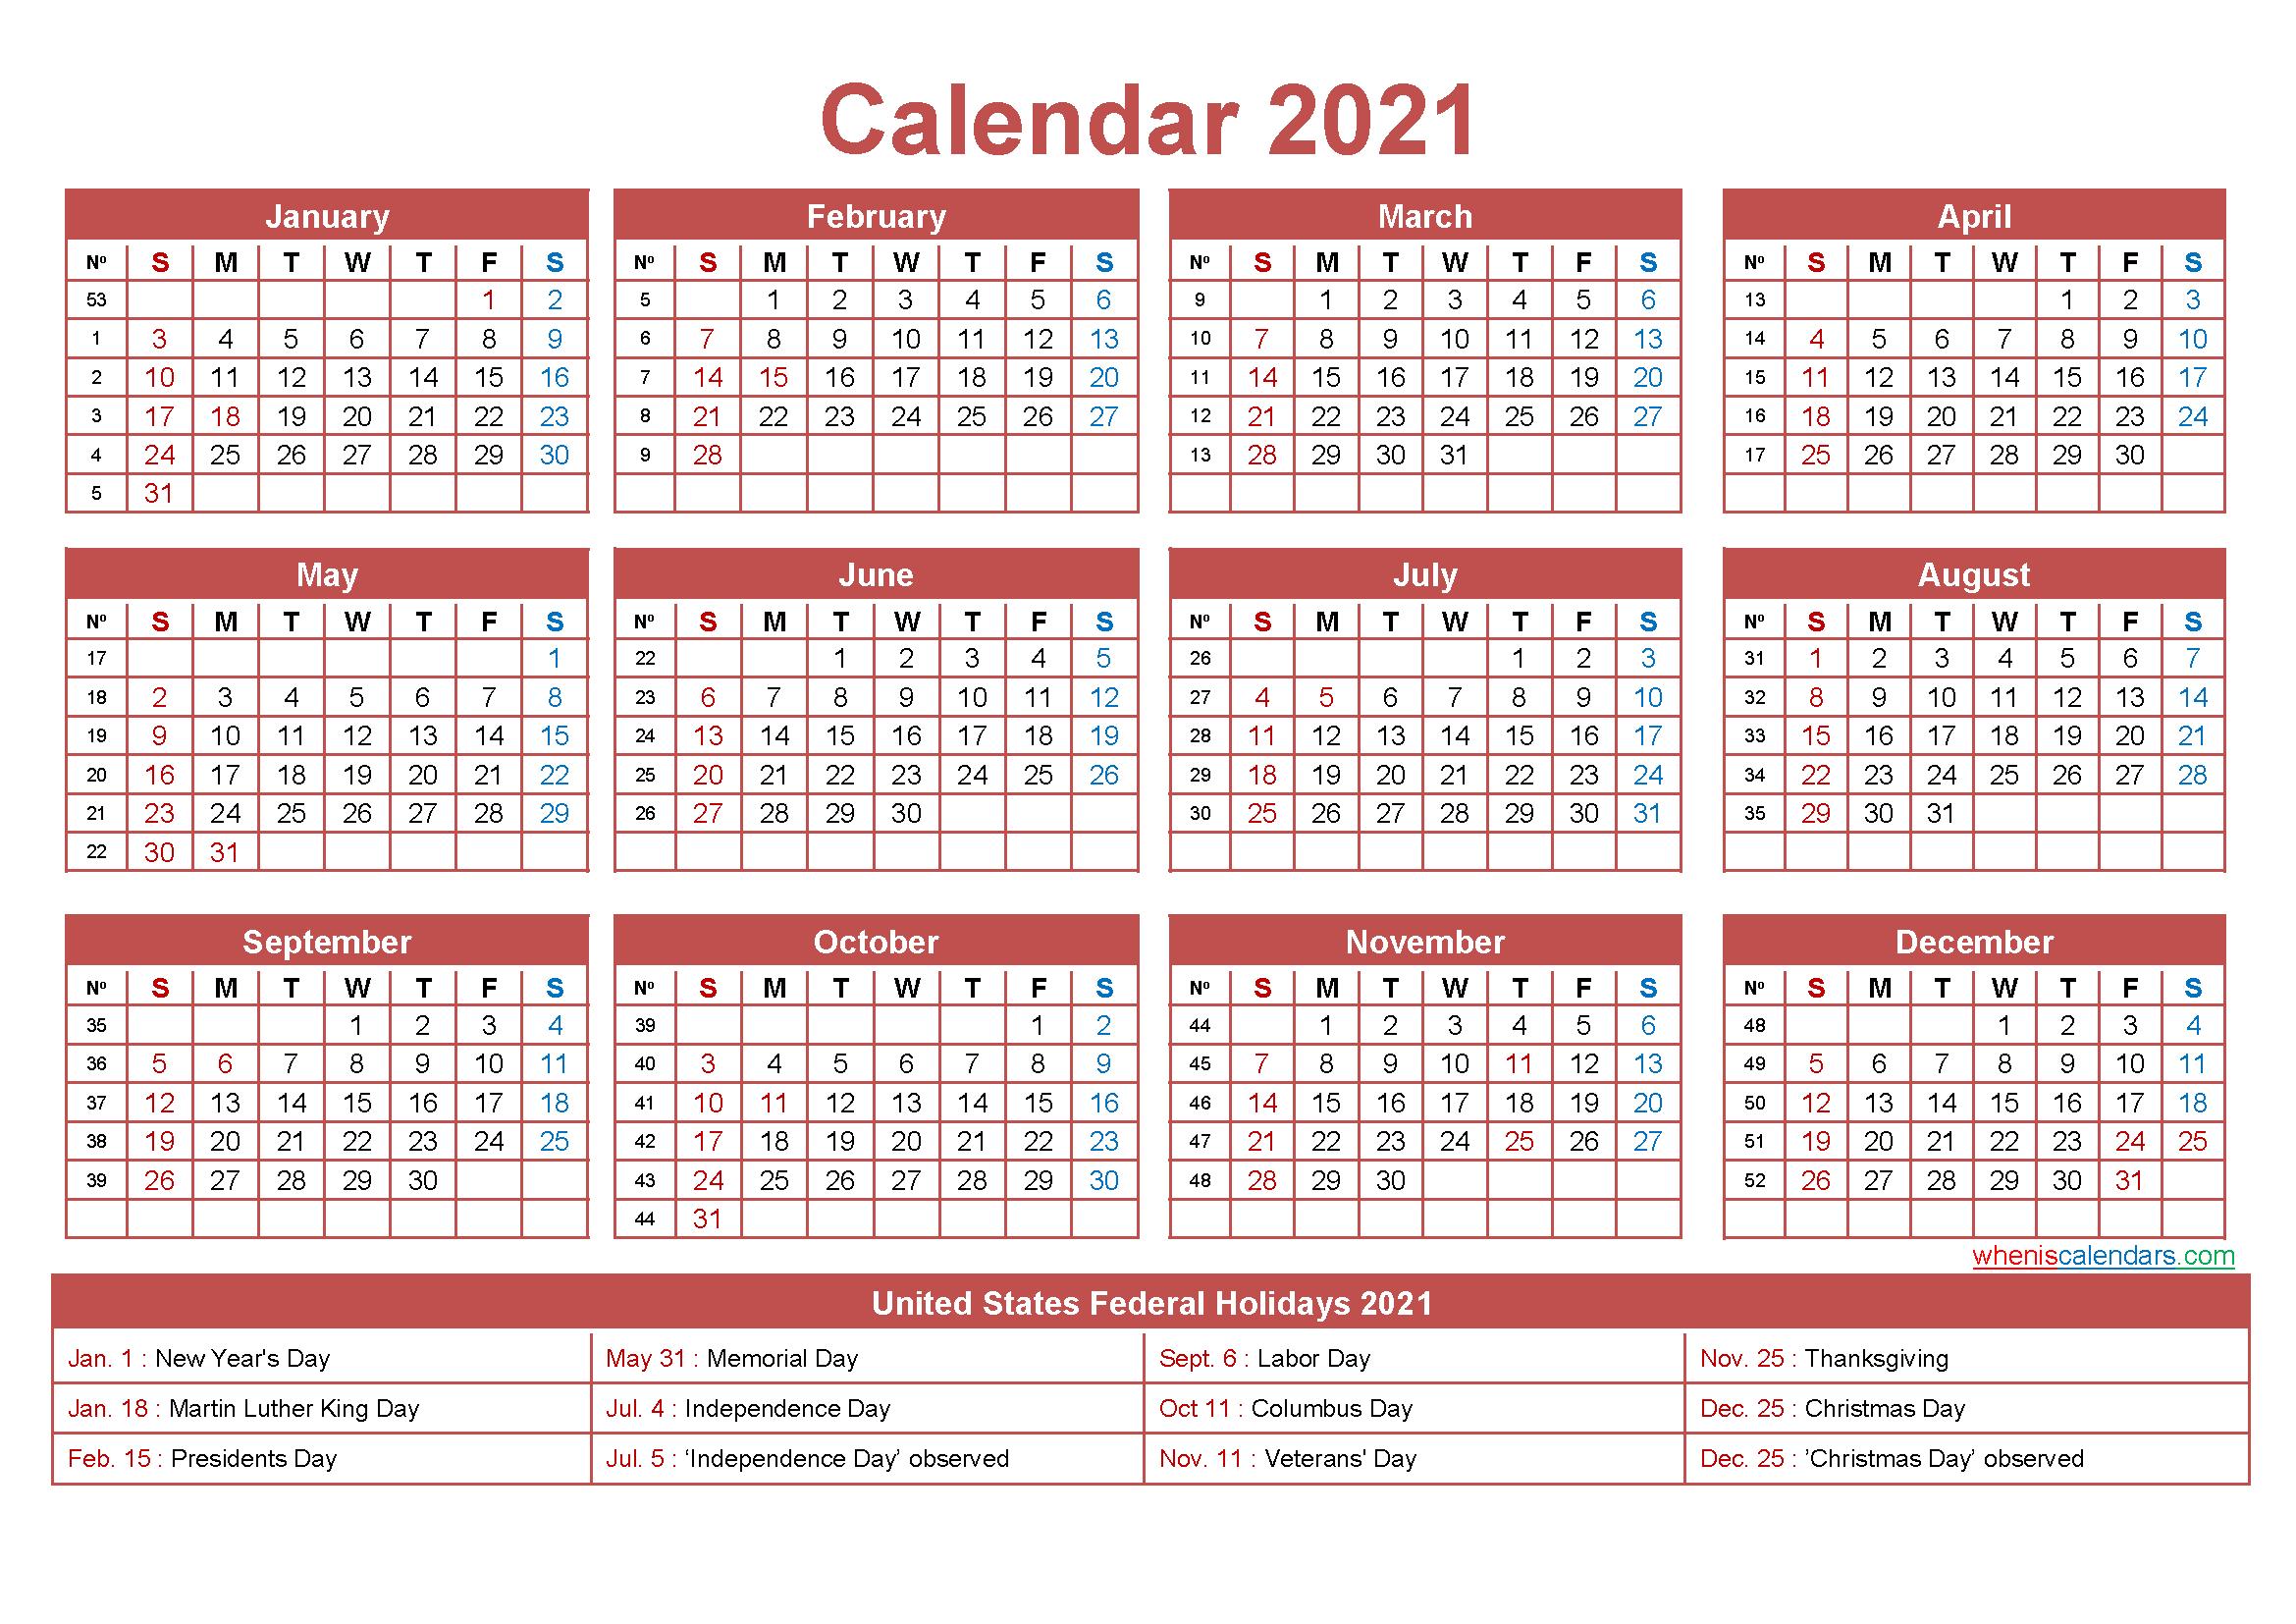 Free Editable 2021 Calendars In Word : January 2021